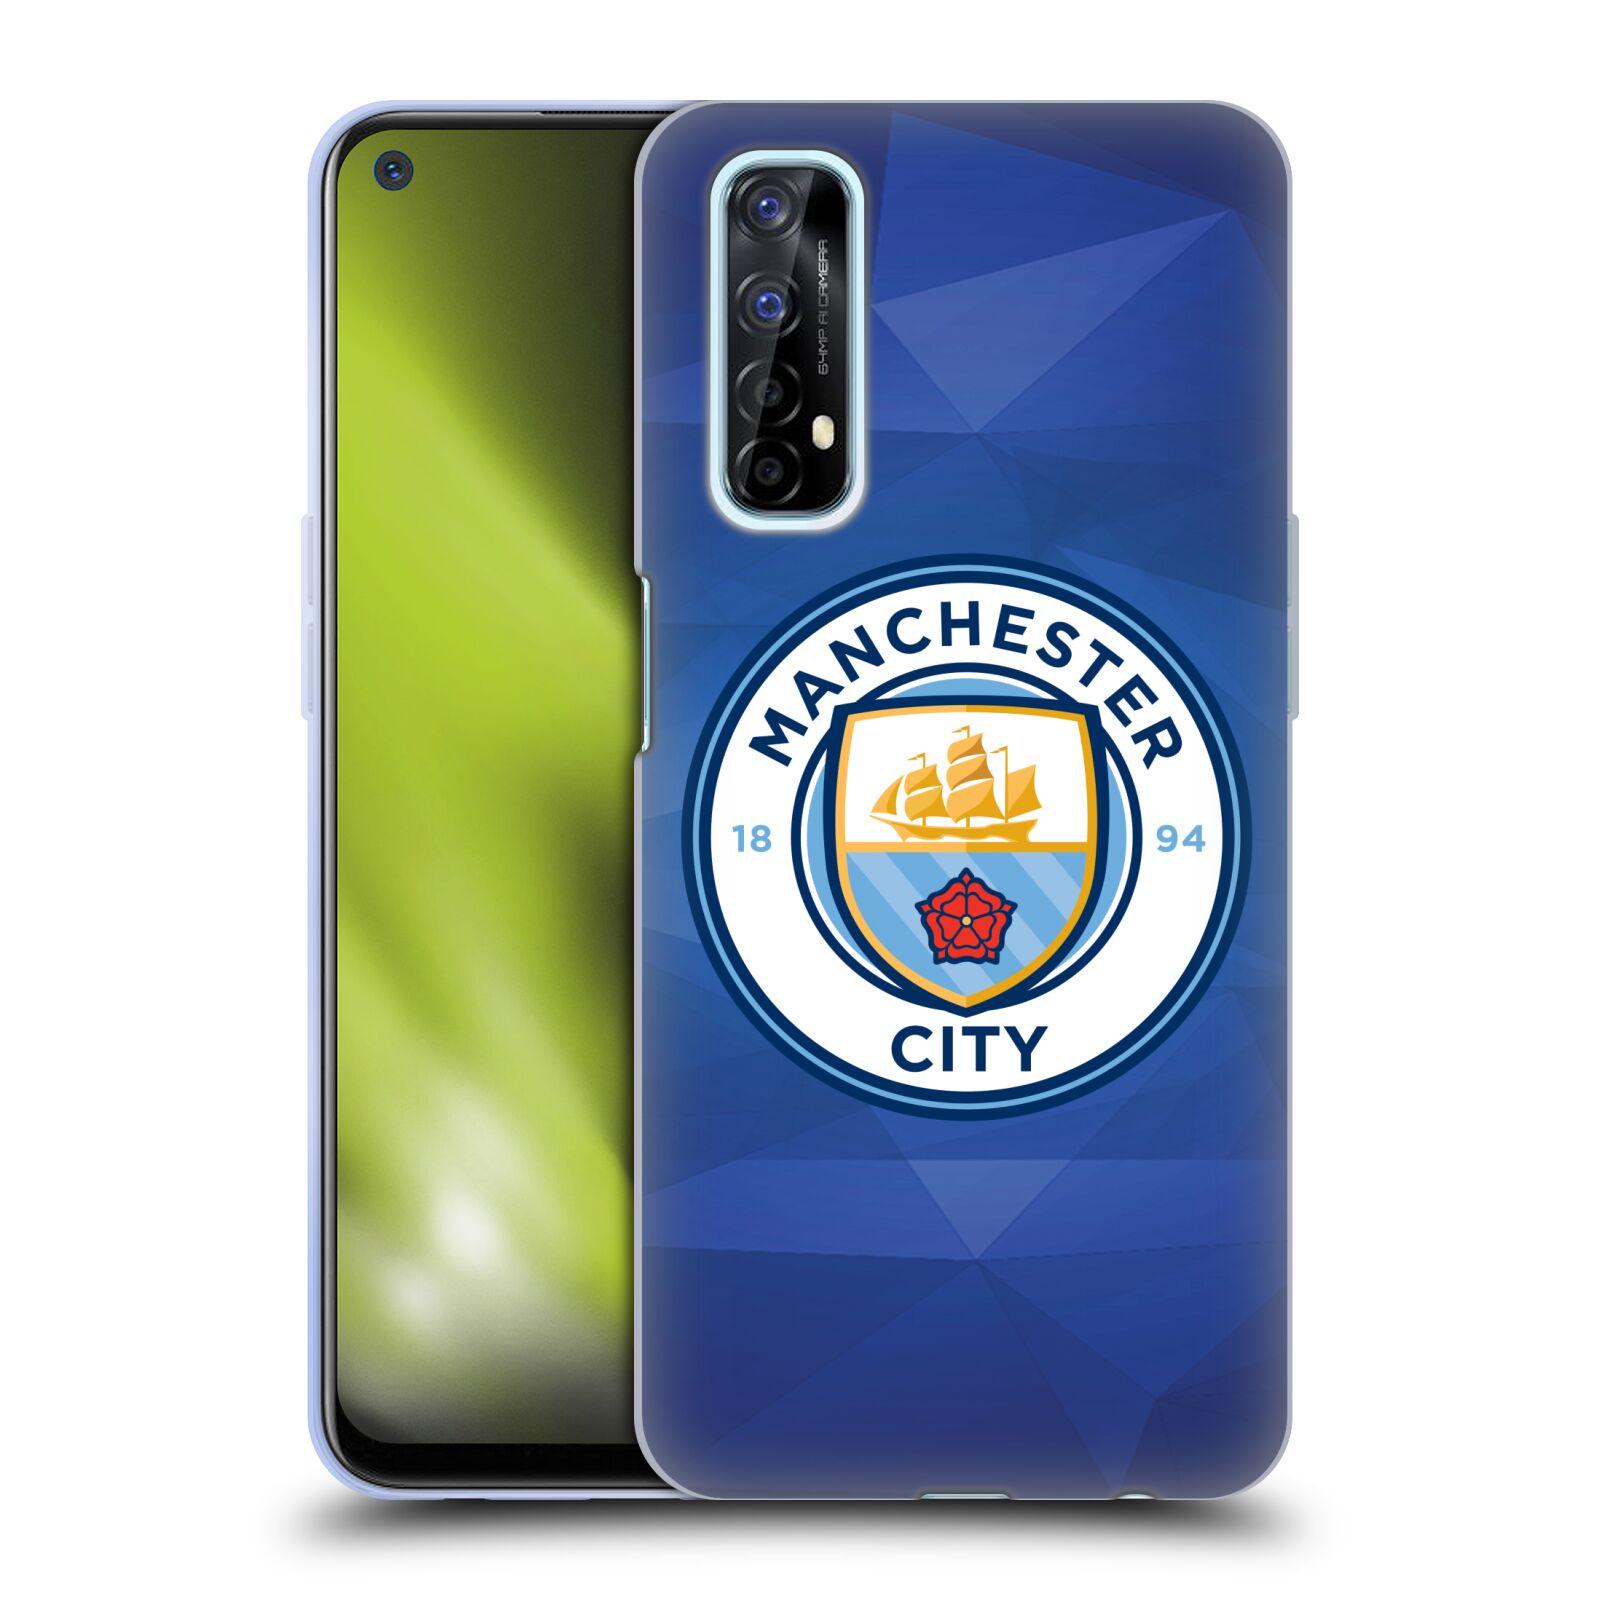 Silikonové pouzdro na mobil Realme 7 - Head Case - Manchester City FC - Modré nové logo